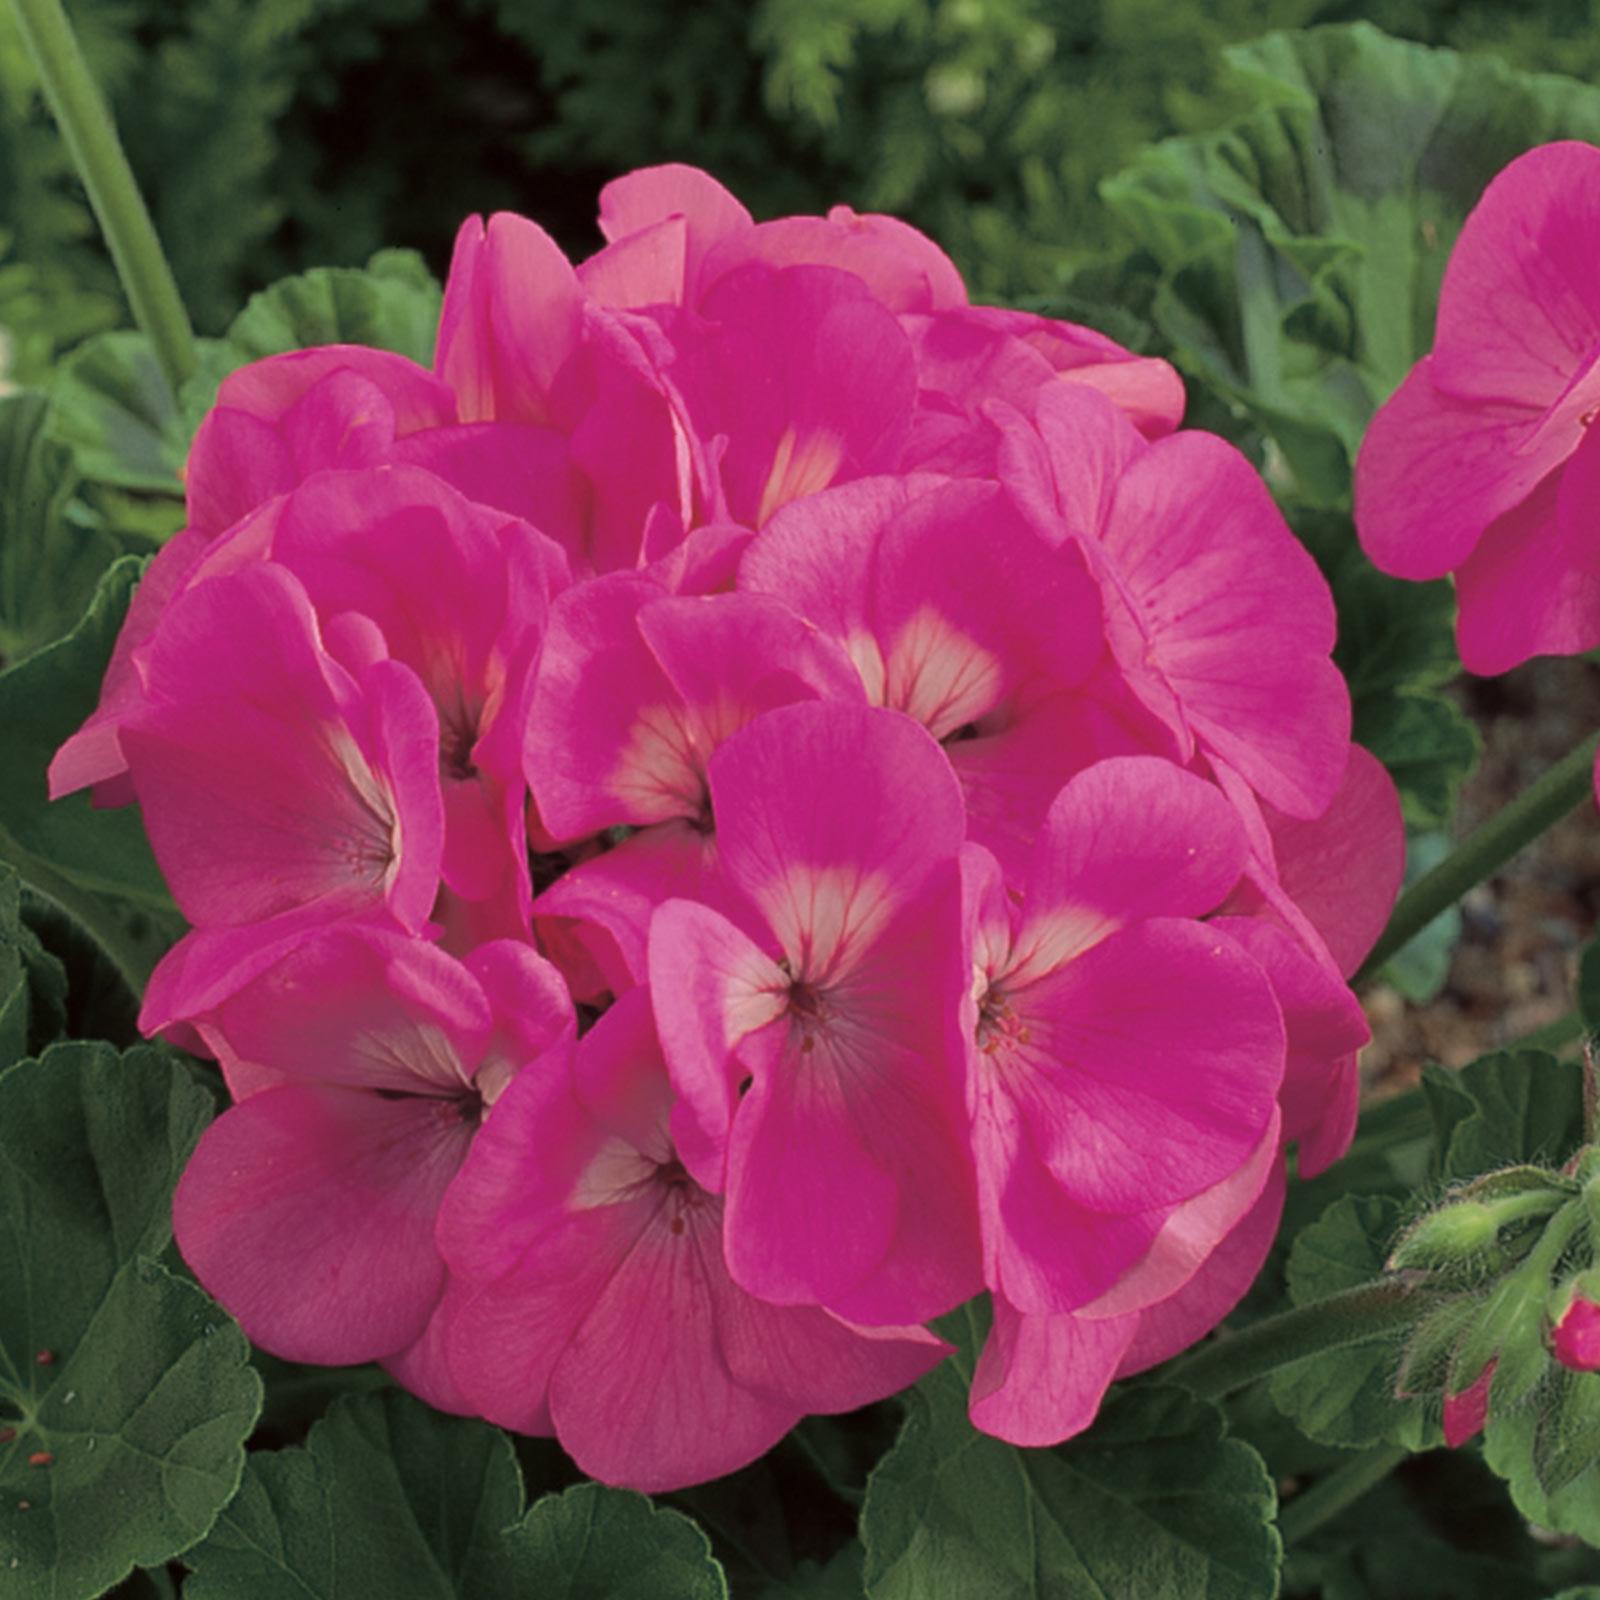 Maverick F1 Series Geranium Flower Garden Seeds - Appleblossom - 100 Seeds - Annual Flower Gardening Seed - Pelargonium x hortorum